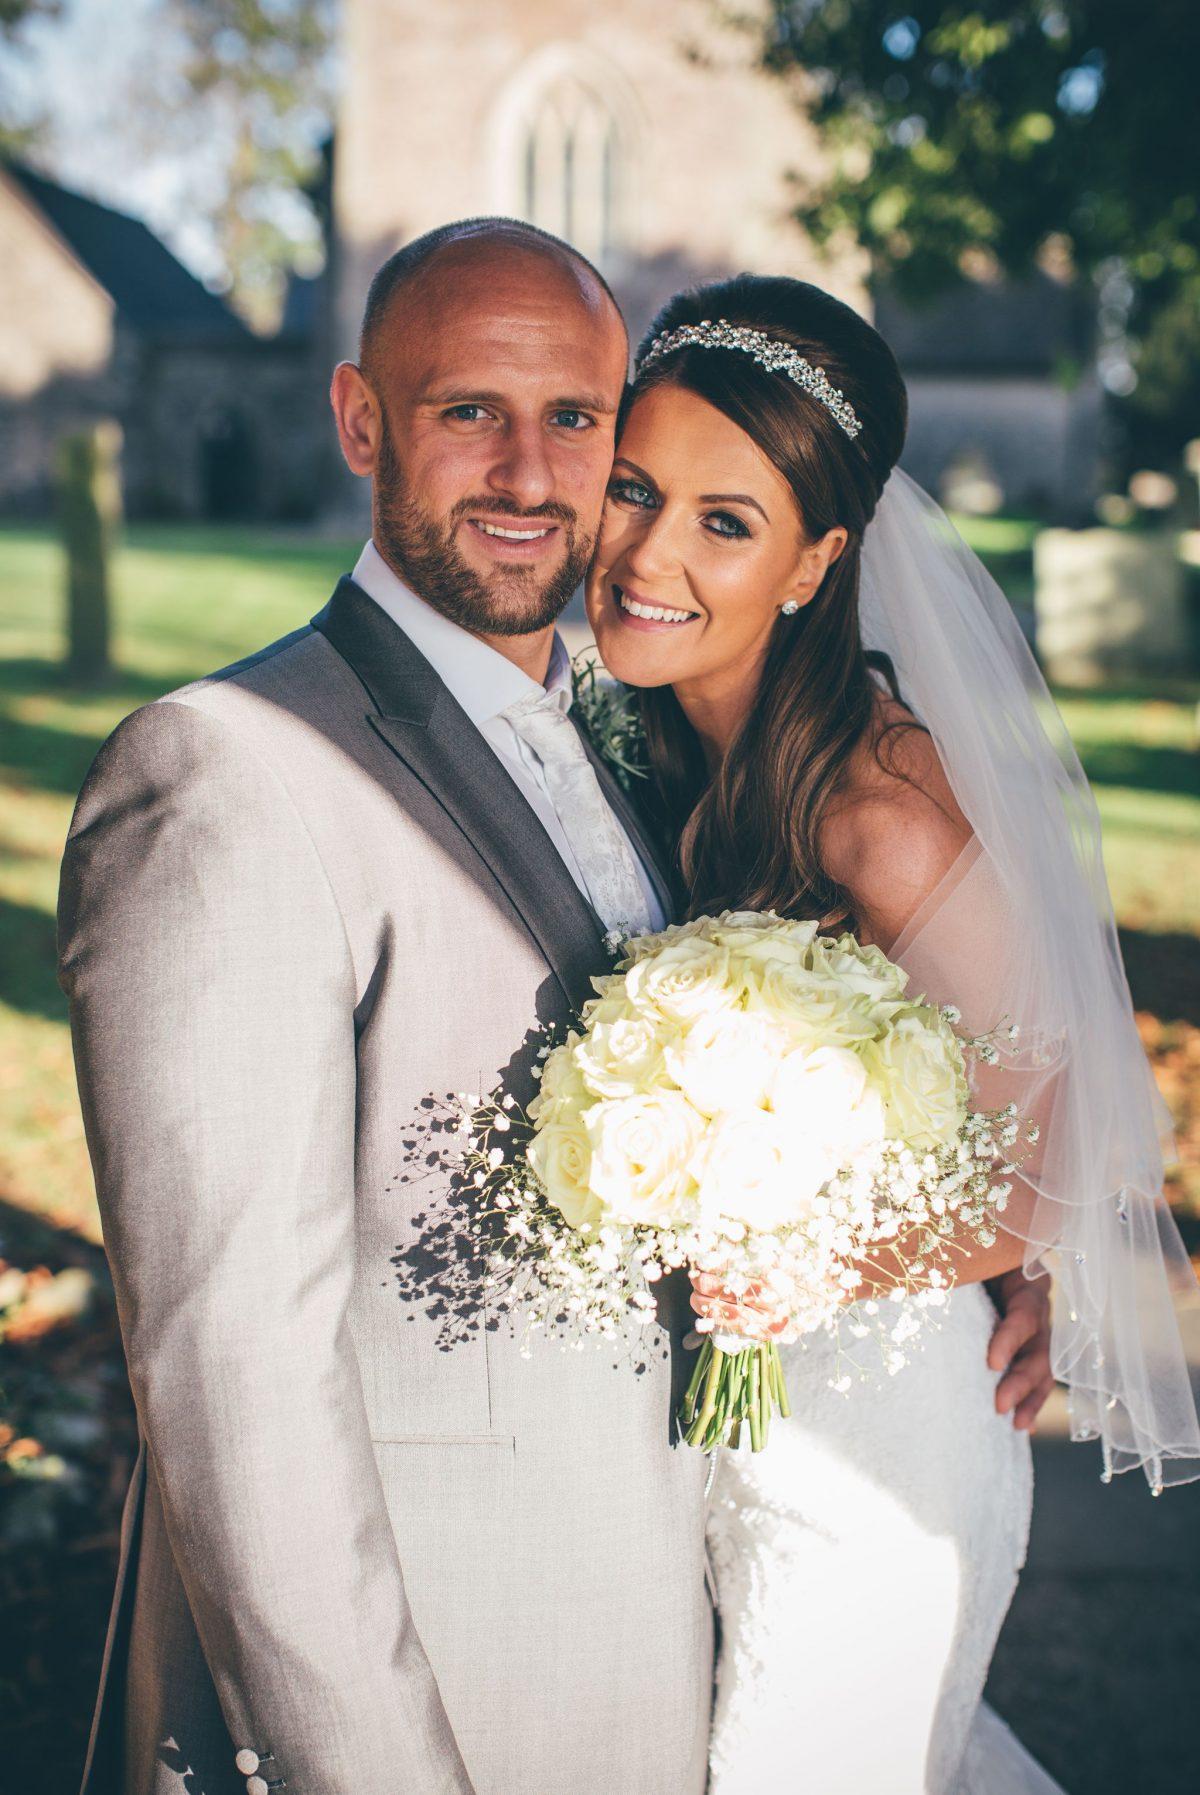 welsh_wedding_photographer_rachel_lambert_photography_decourceys_cardiff_rhiannon_gavin_ 45